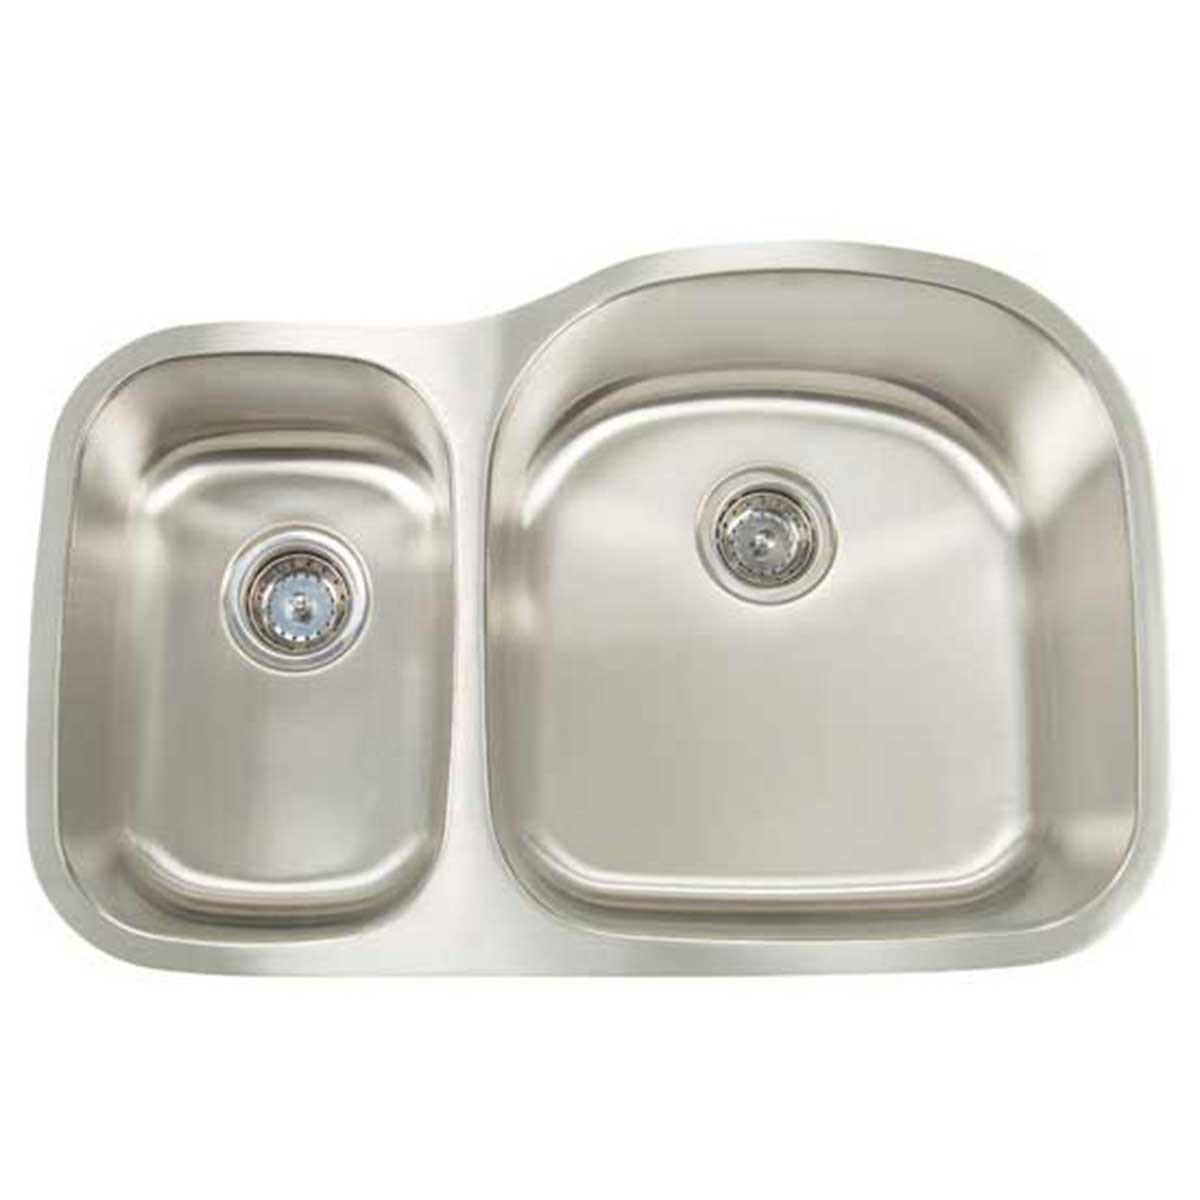 AR3220-D9/7 Artisan Sinks